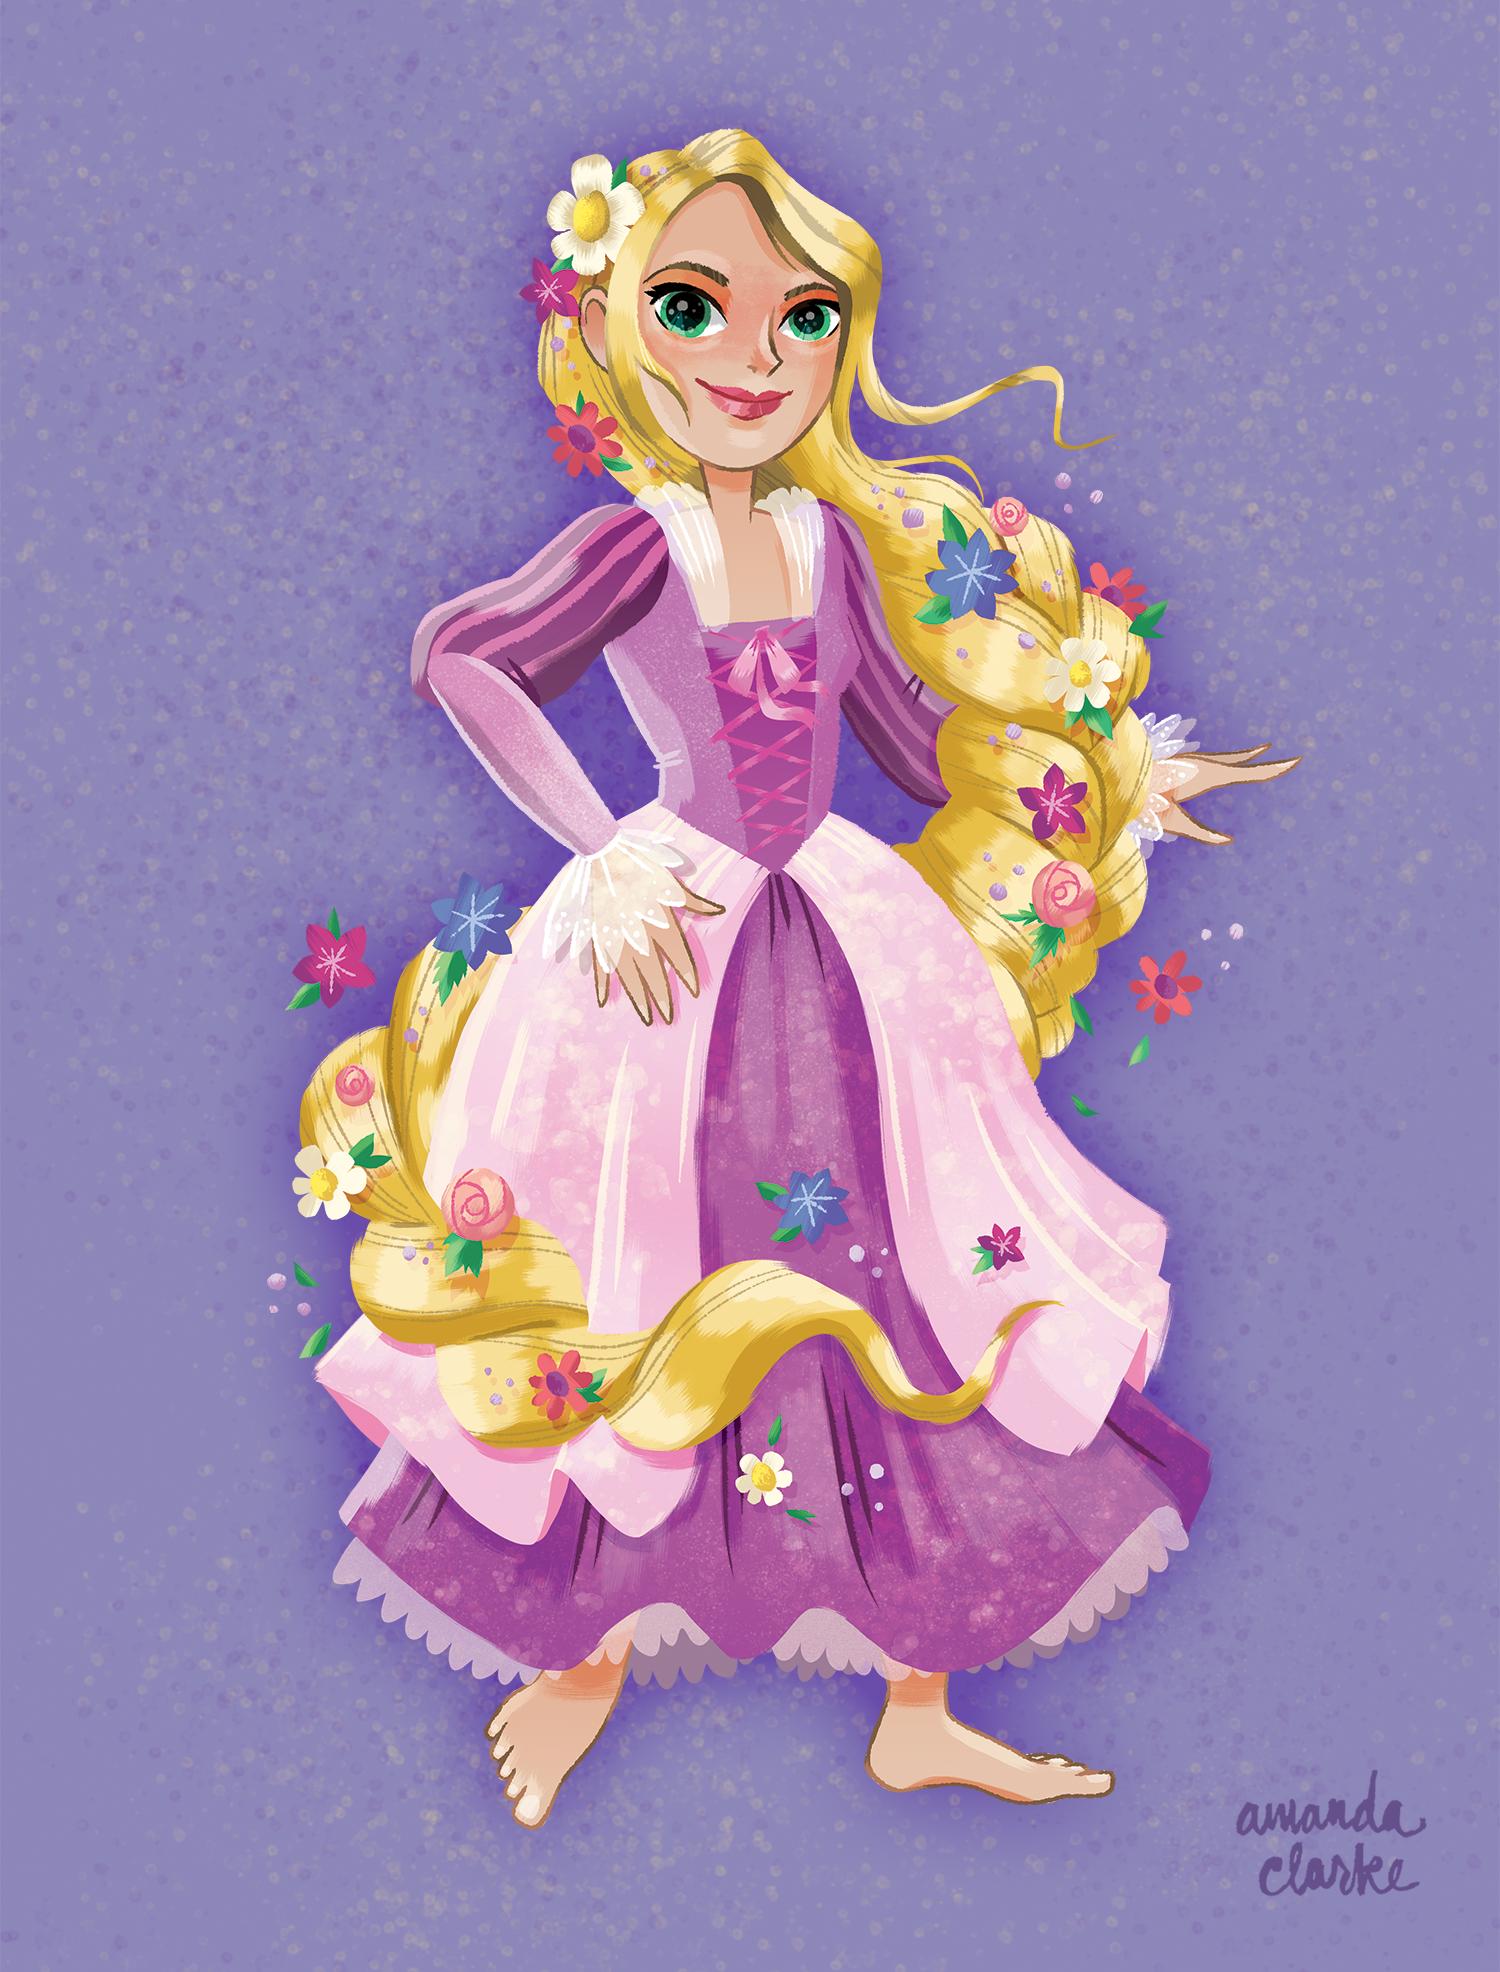 Rapunzel character concept for Hasbro's Disney Dreamers line.